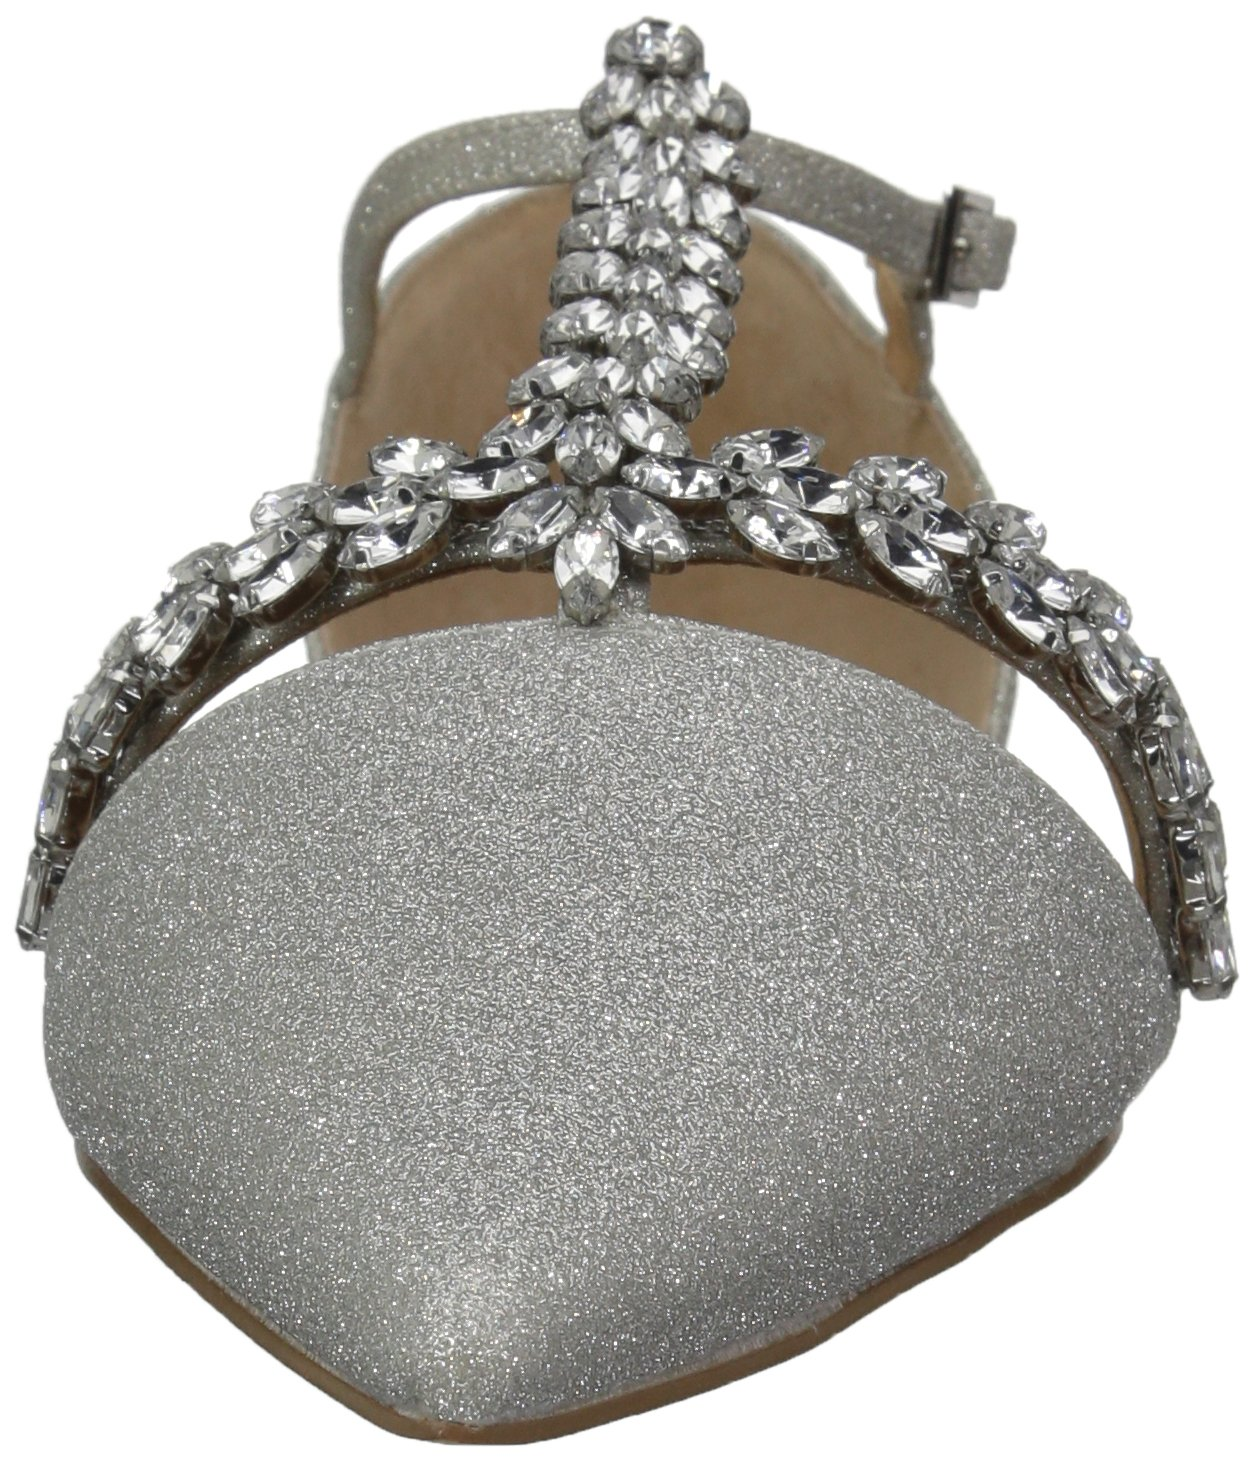 Badgley Mischka 10 Jewel Women's Maury Mary Jane Flat B07864V3GR 10 Mischka B(M) US|Silver Glitter 09cdca